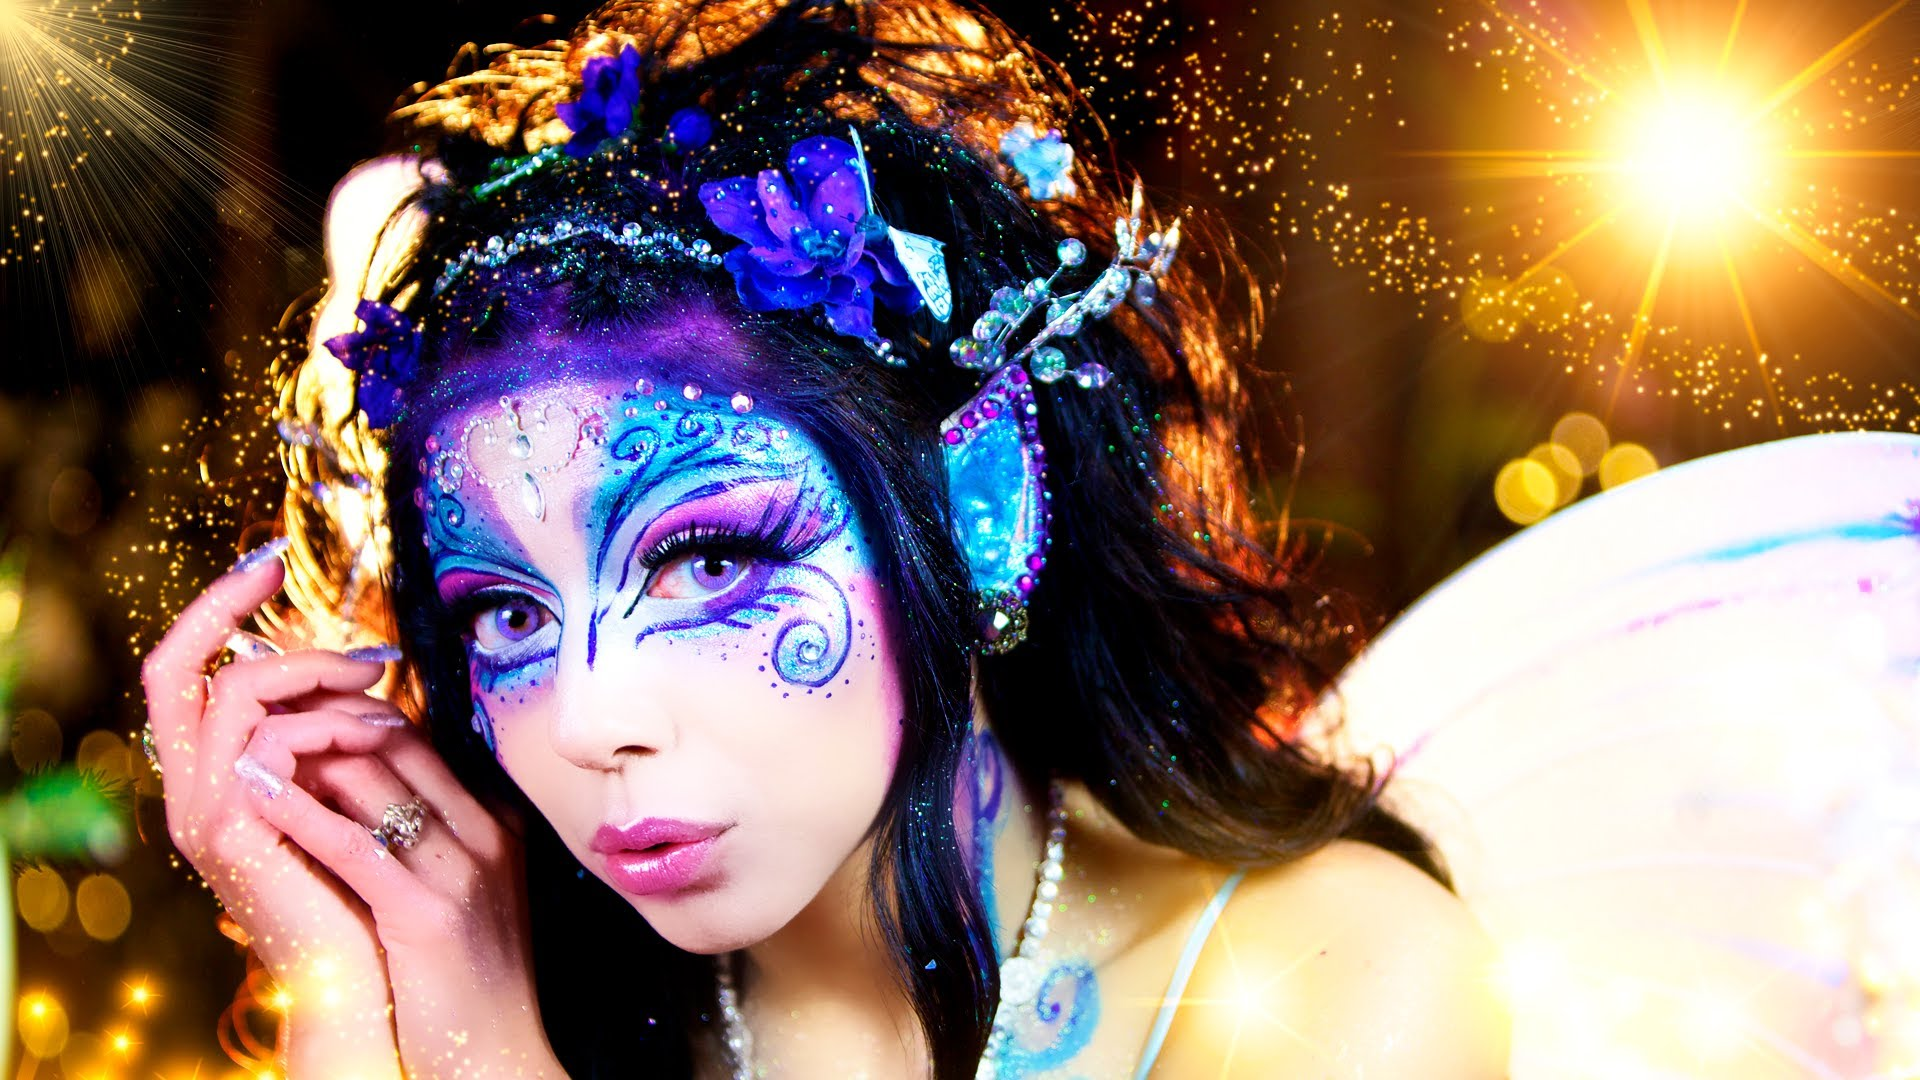 Halloween makeup ideas: 17 magical fairy makeup tutorials ...